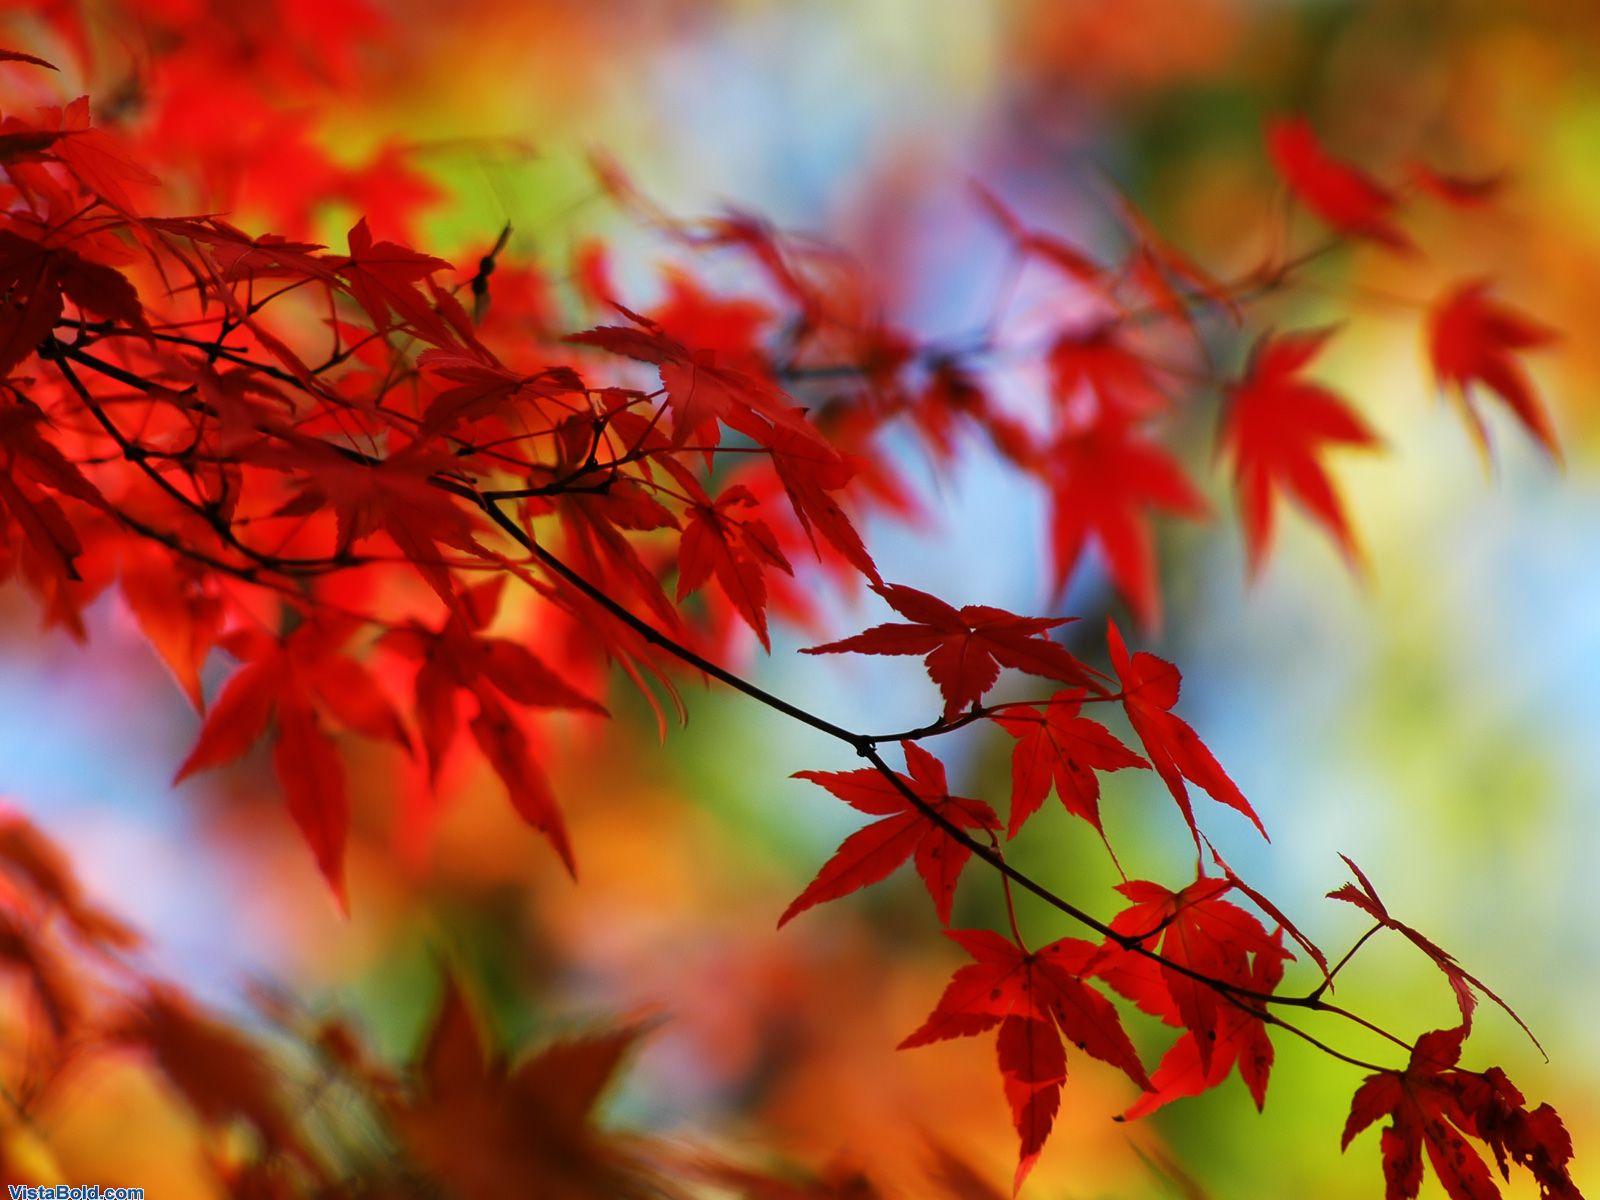 http://2.bp.blogspot.com/_RAlP3BmEW1Q/TQNis14ITDI/AAAAAAAABNo/T6OYH5Ai-TA/s1600/Herfst-achtergronden-herfst-wallpapers-21.jpg